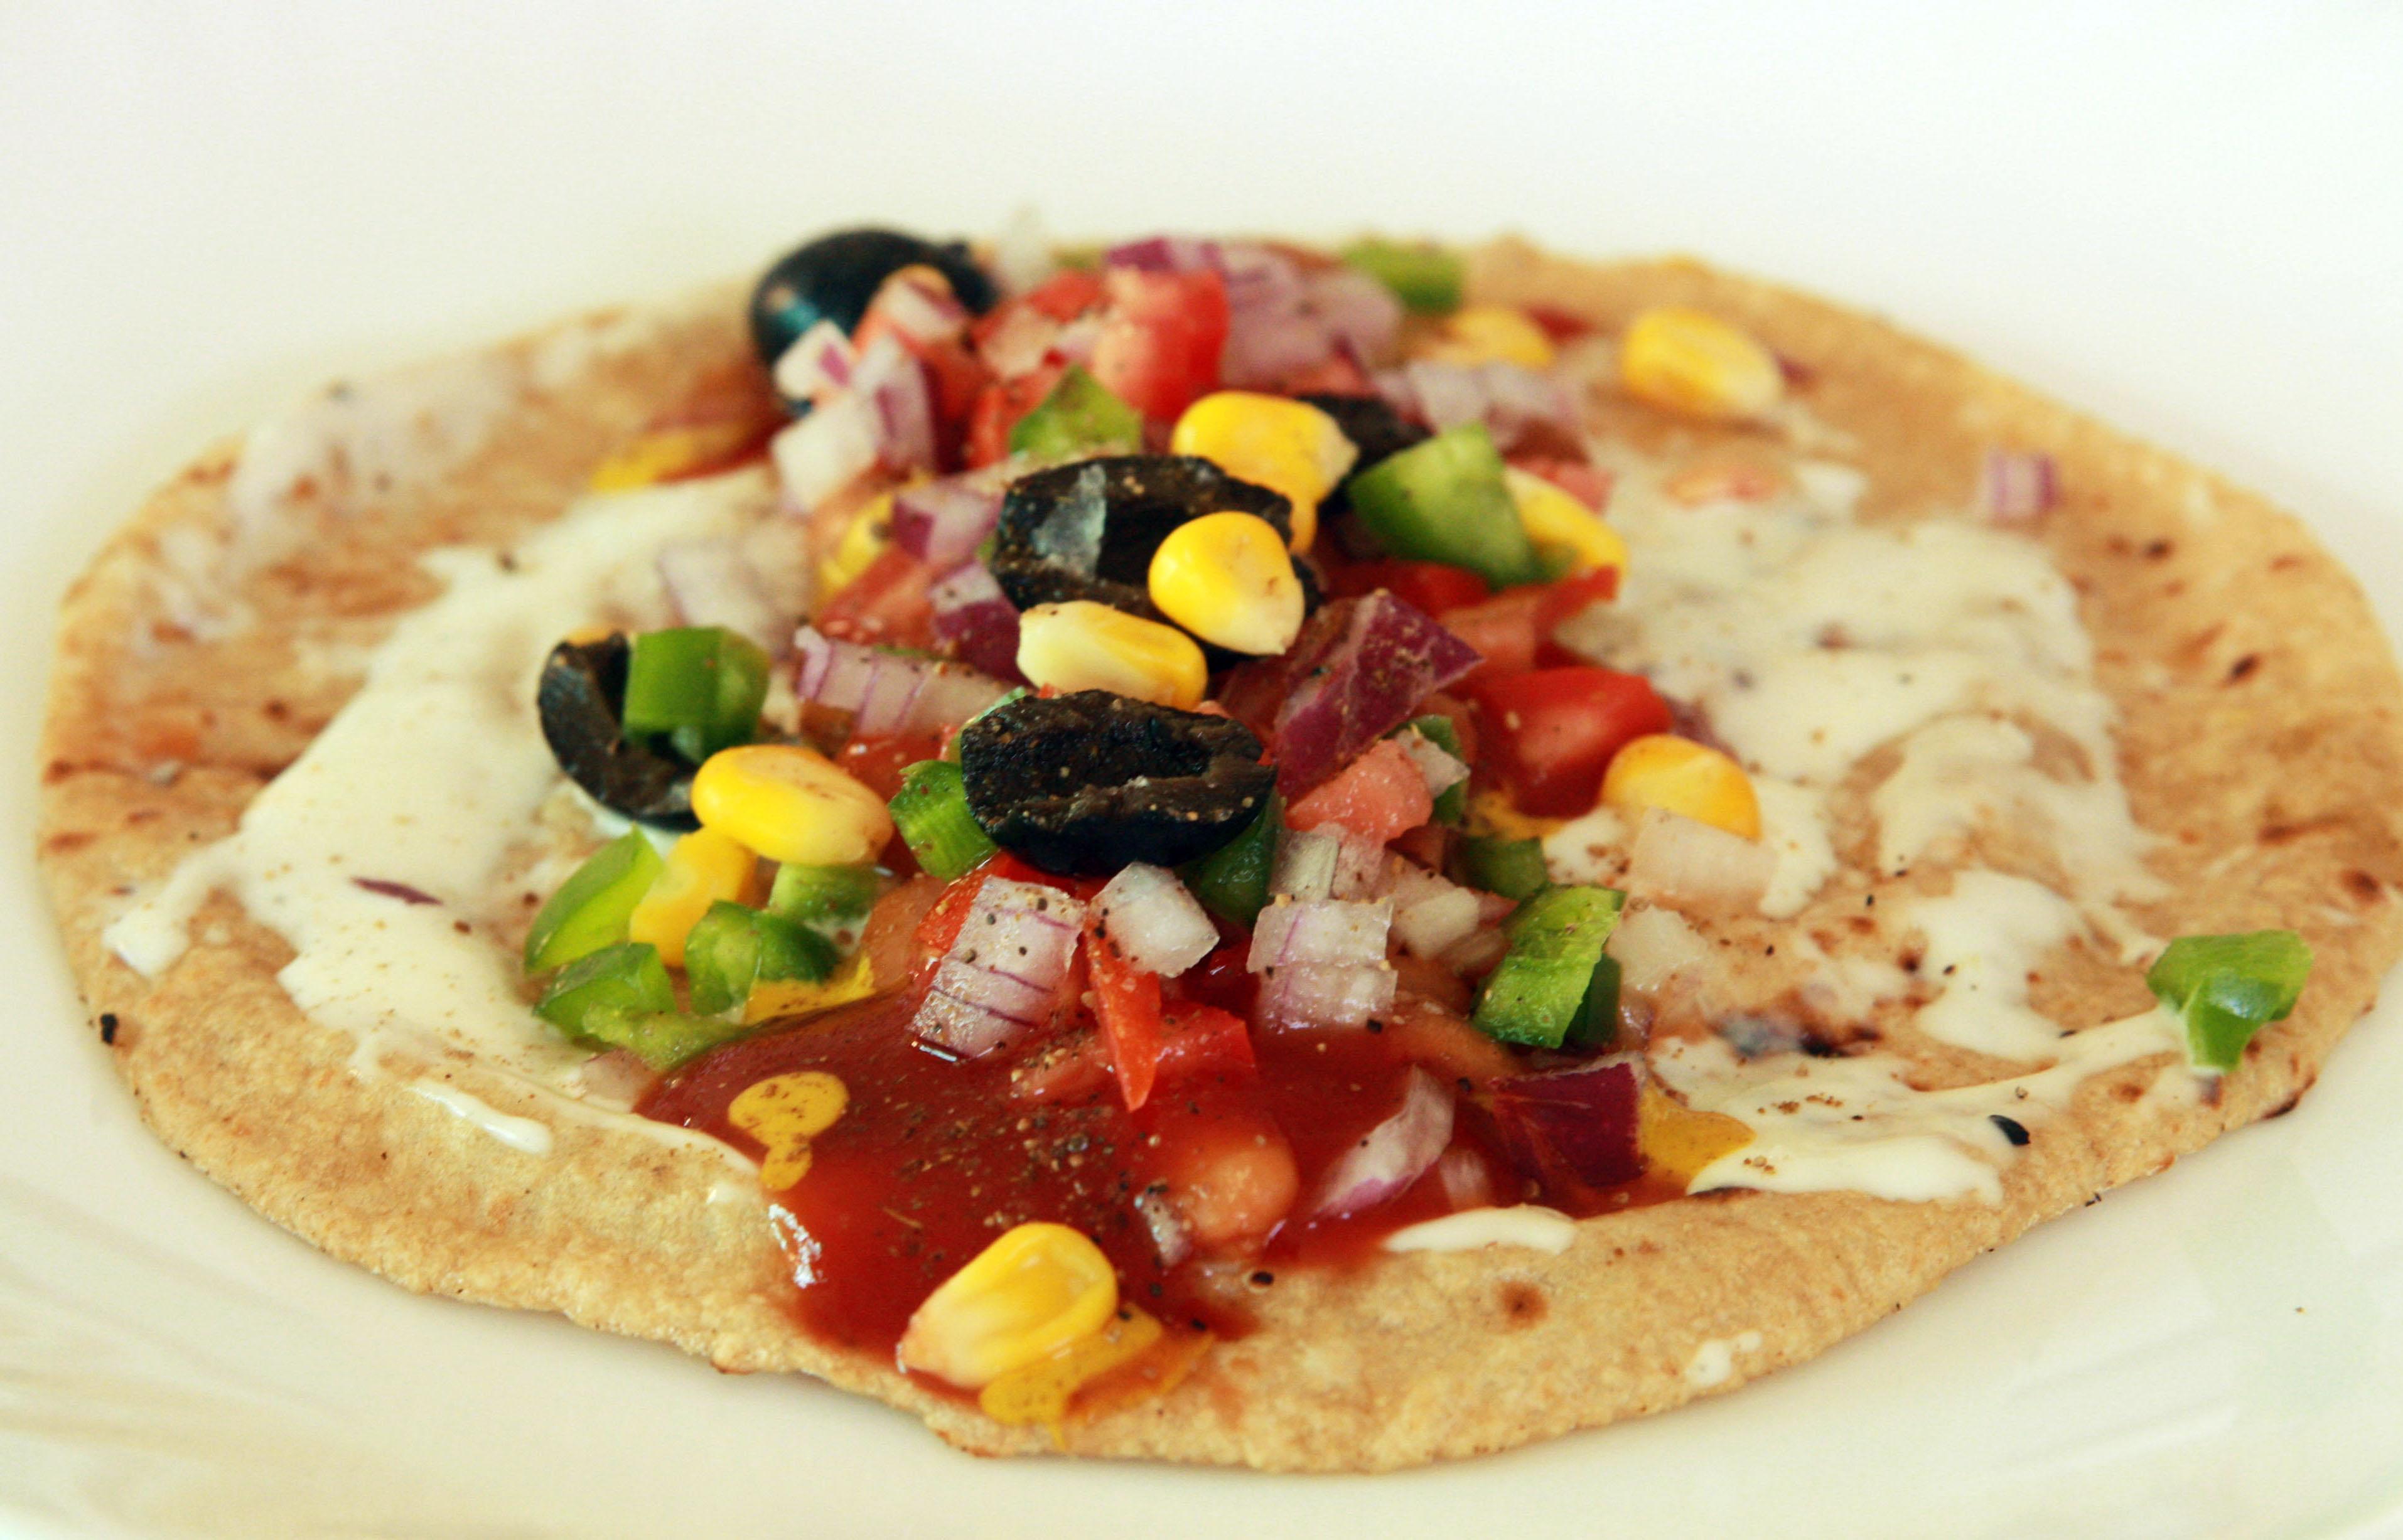 For red kidney bean burritos: